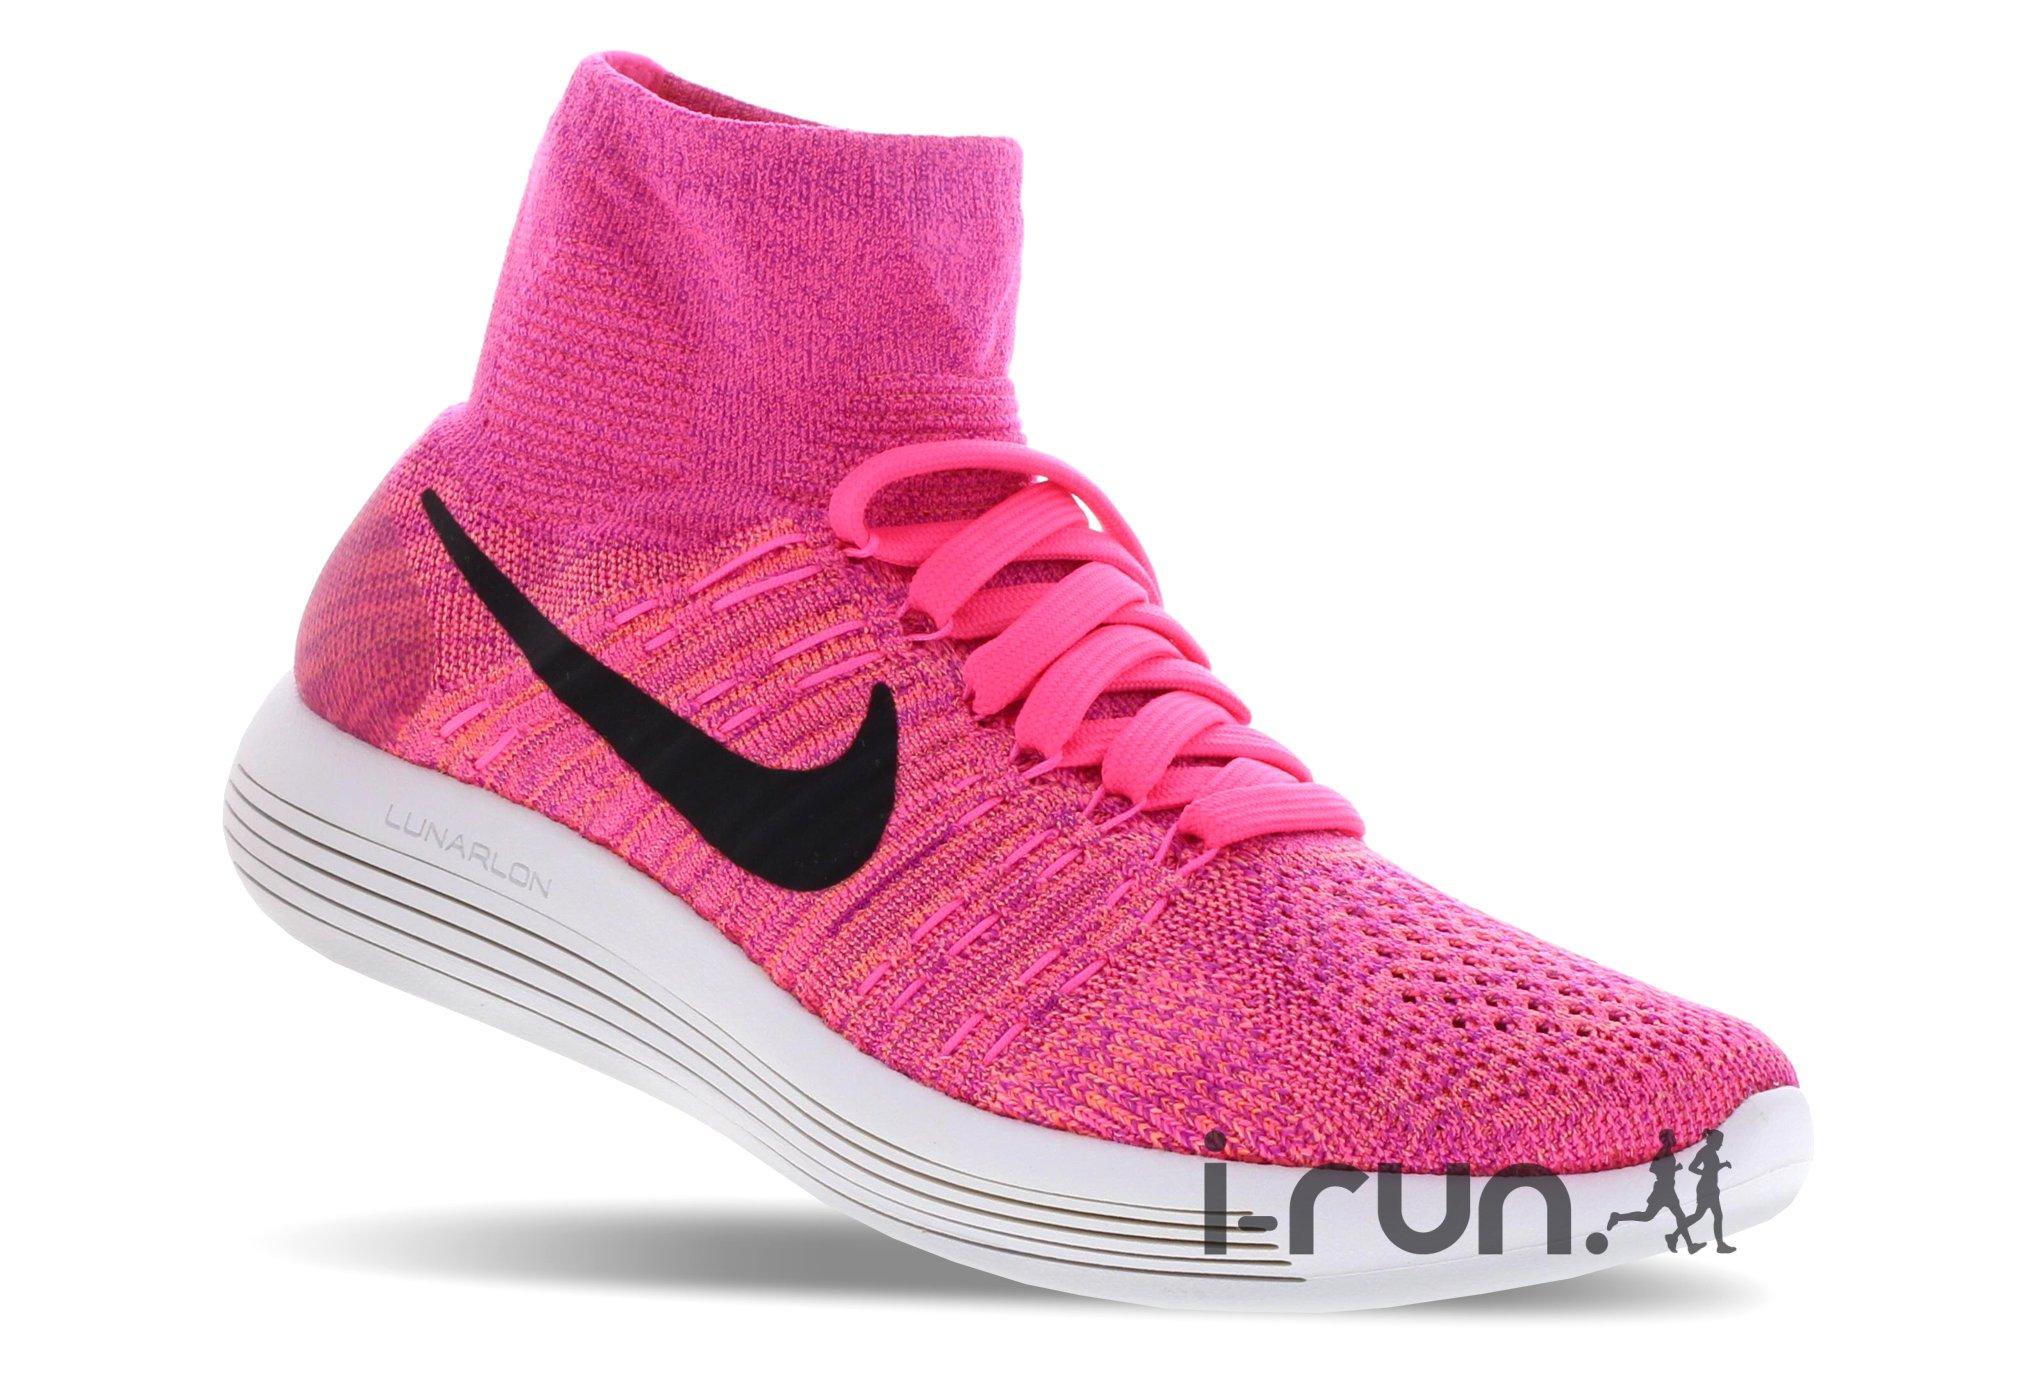 Nike LunarEpic Flyknit W Chaussures running femme